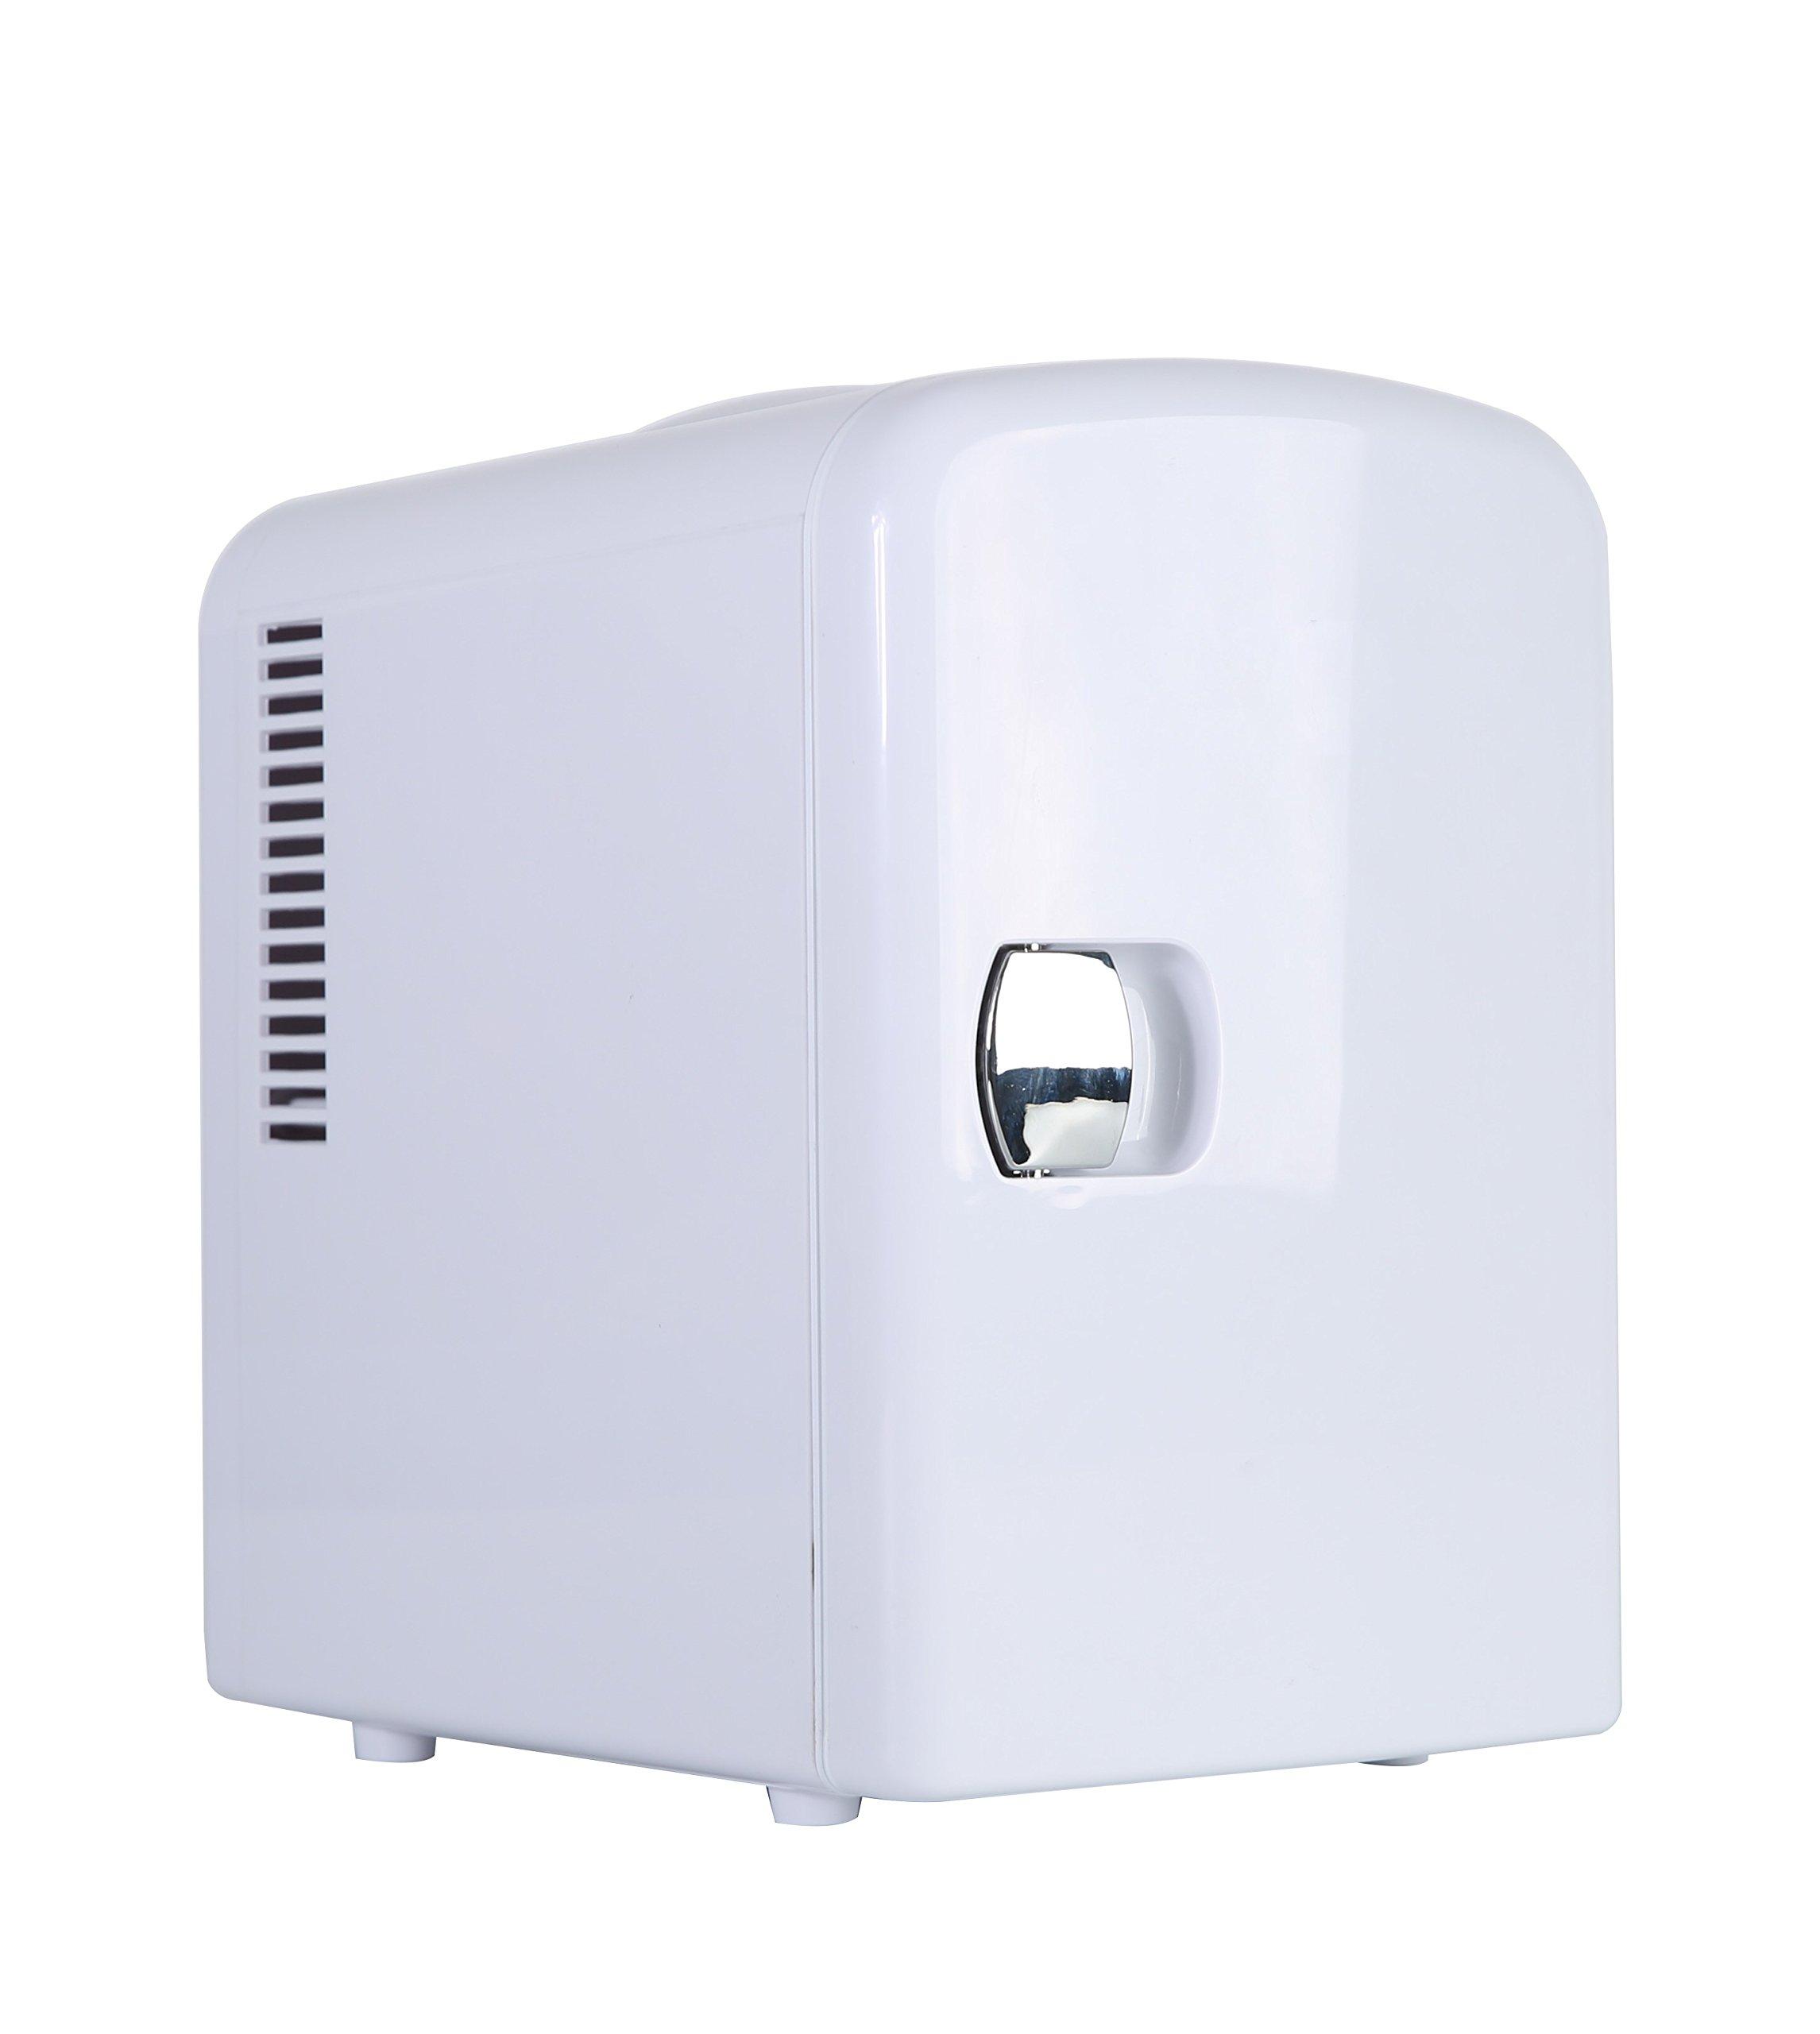 Portable 6 Can Mini Fridge Cooler - Home,Office, Car or Boat - AC & DC - White - 110/120V